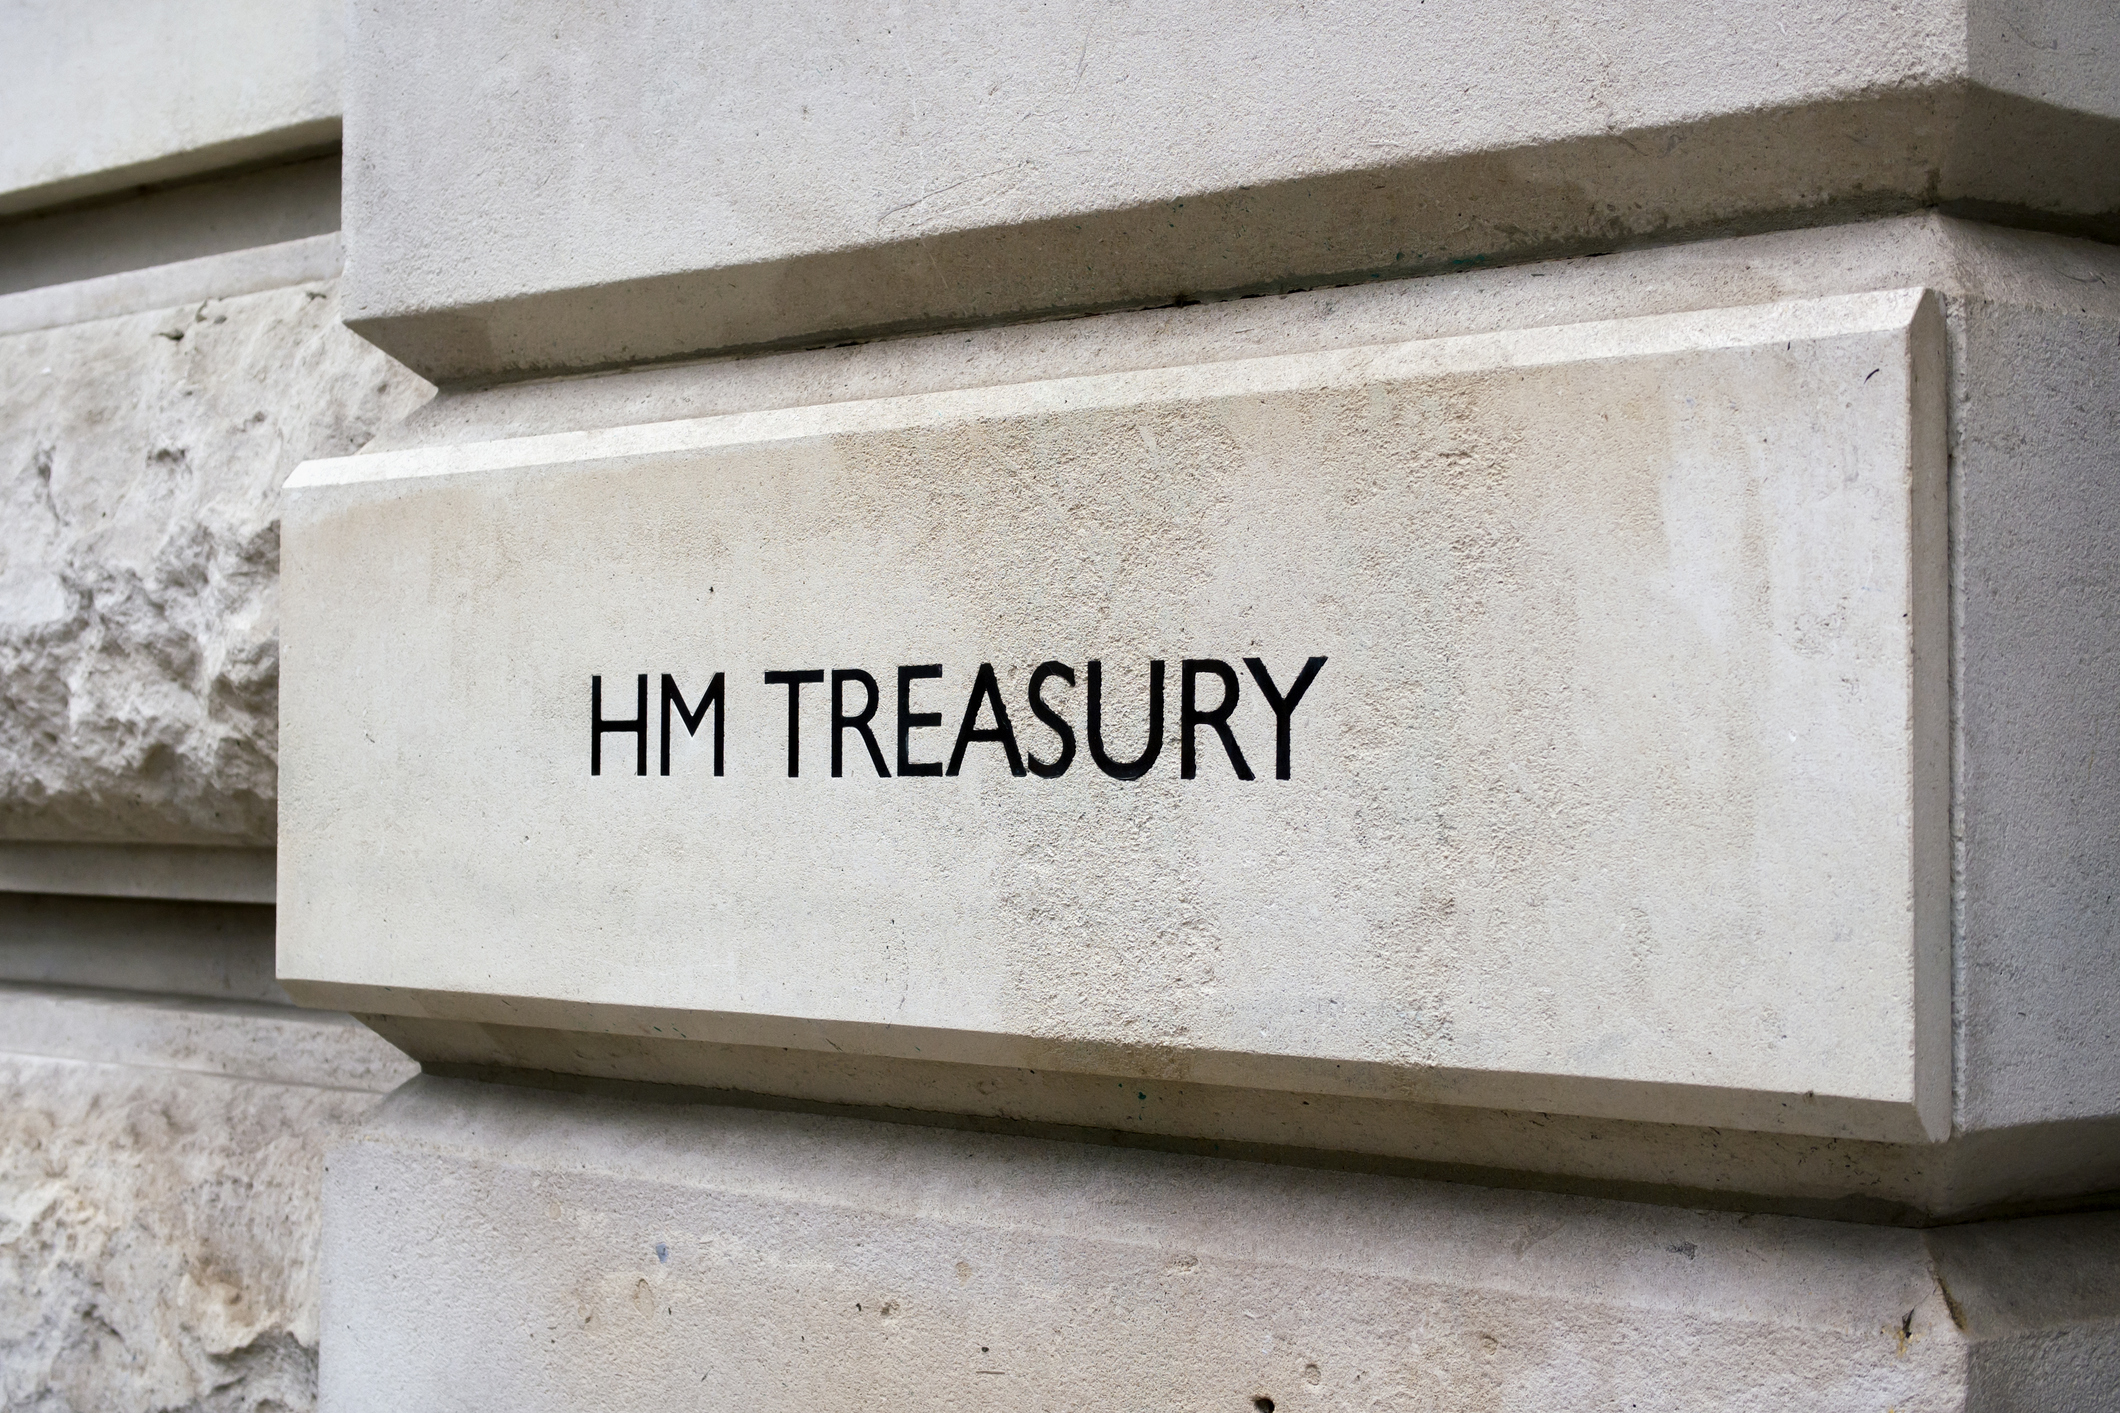 British Government Treasury sign